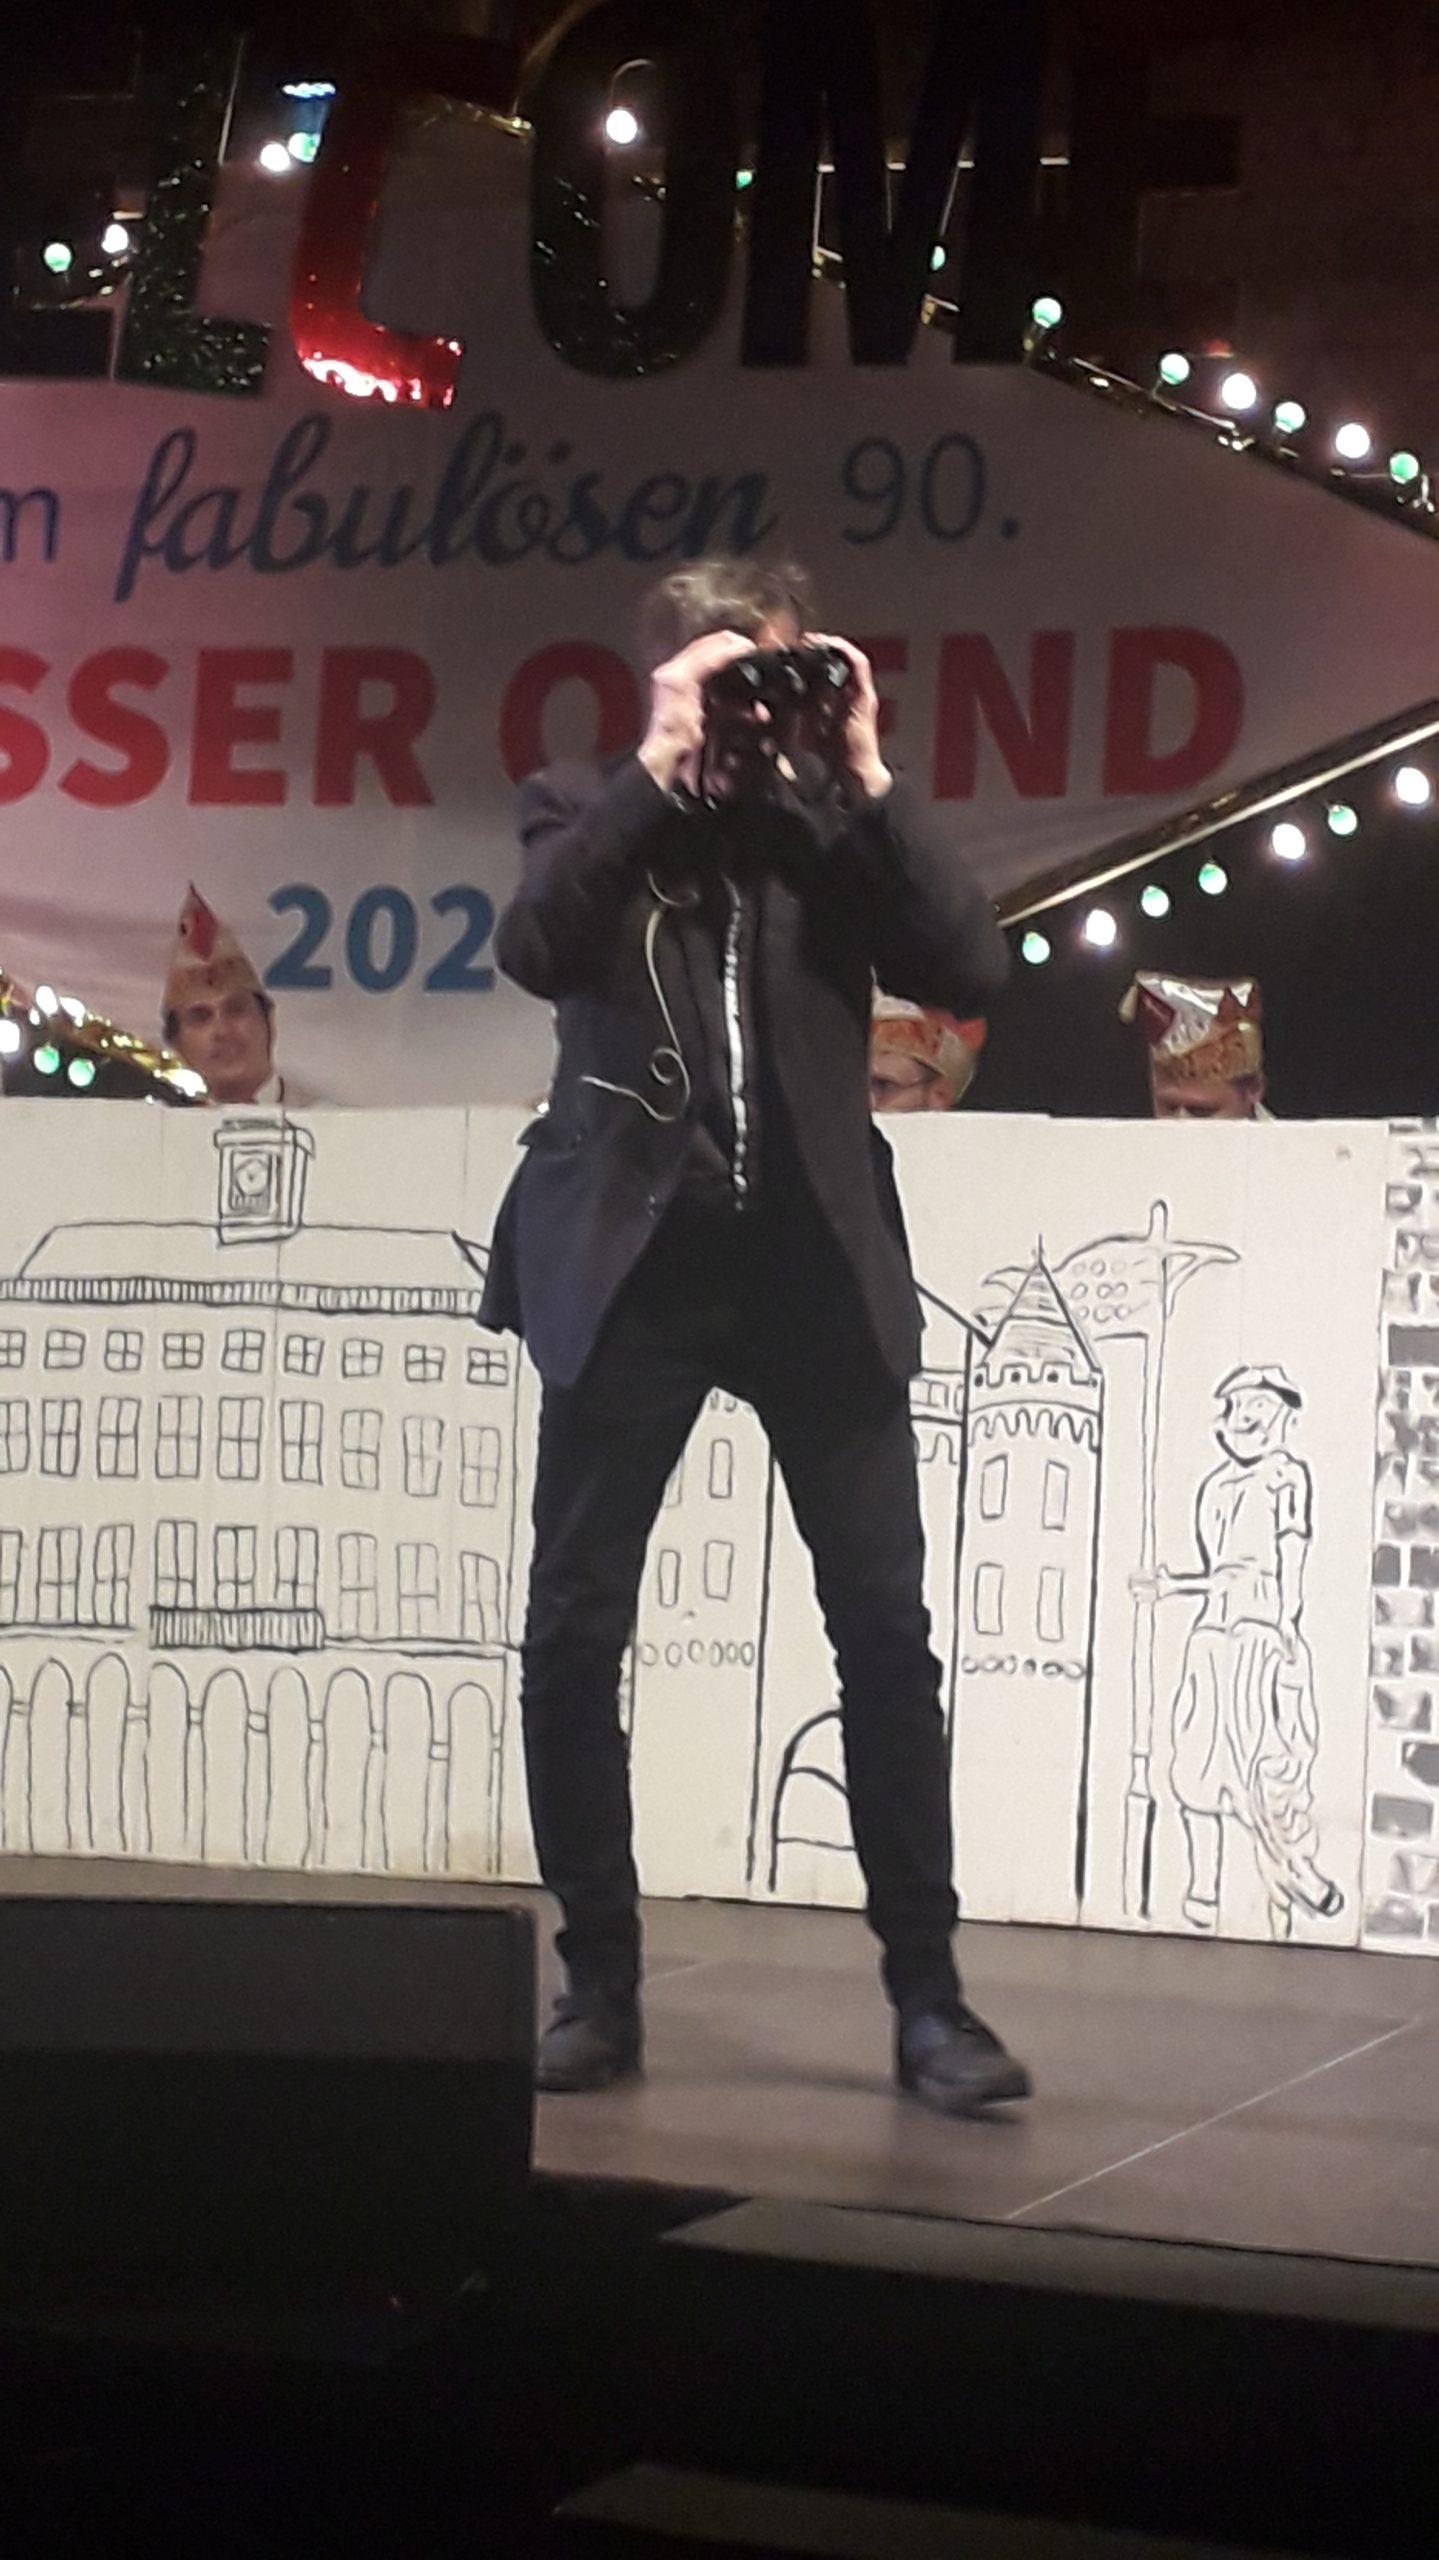 Nüsser Ovend: Prologius Michael Klinkicht